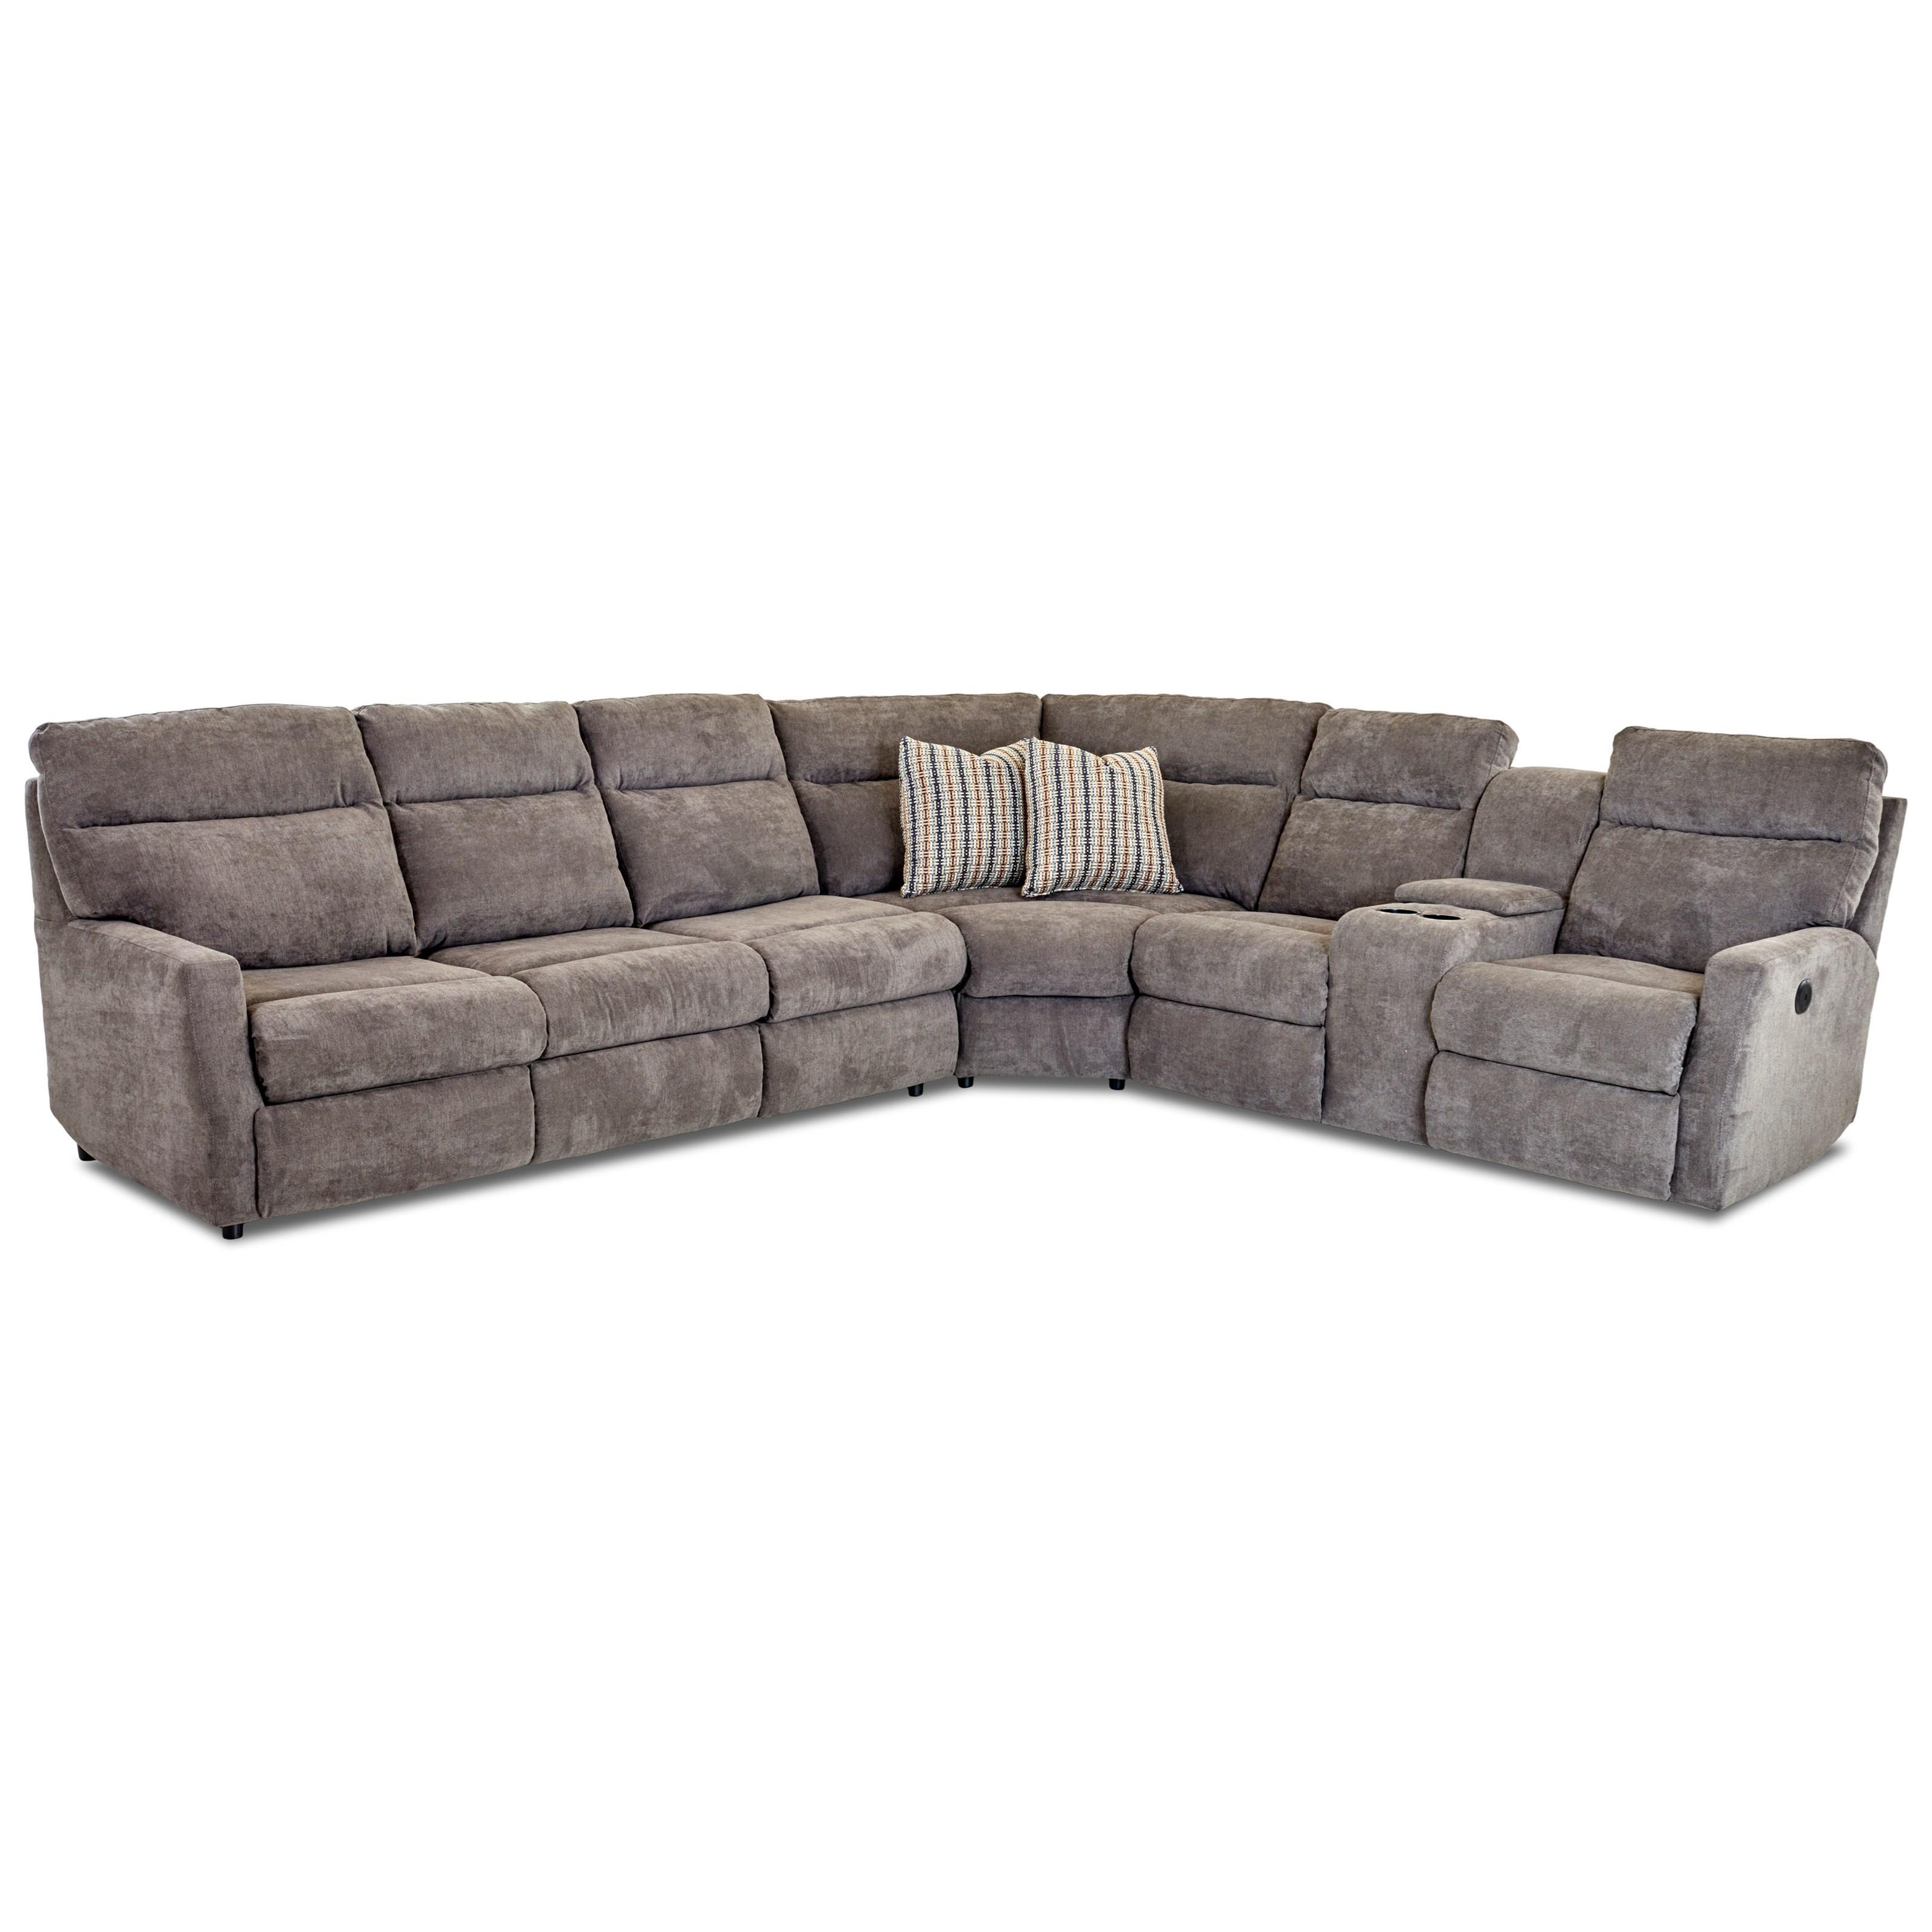 daphne 5 seat reclining sectional w laf sleeper